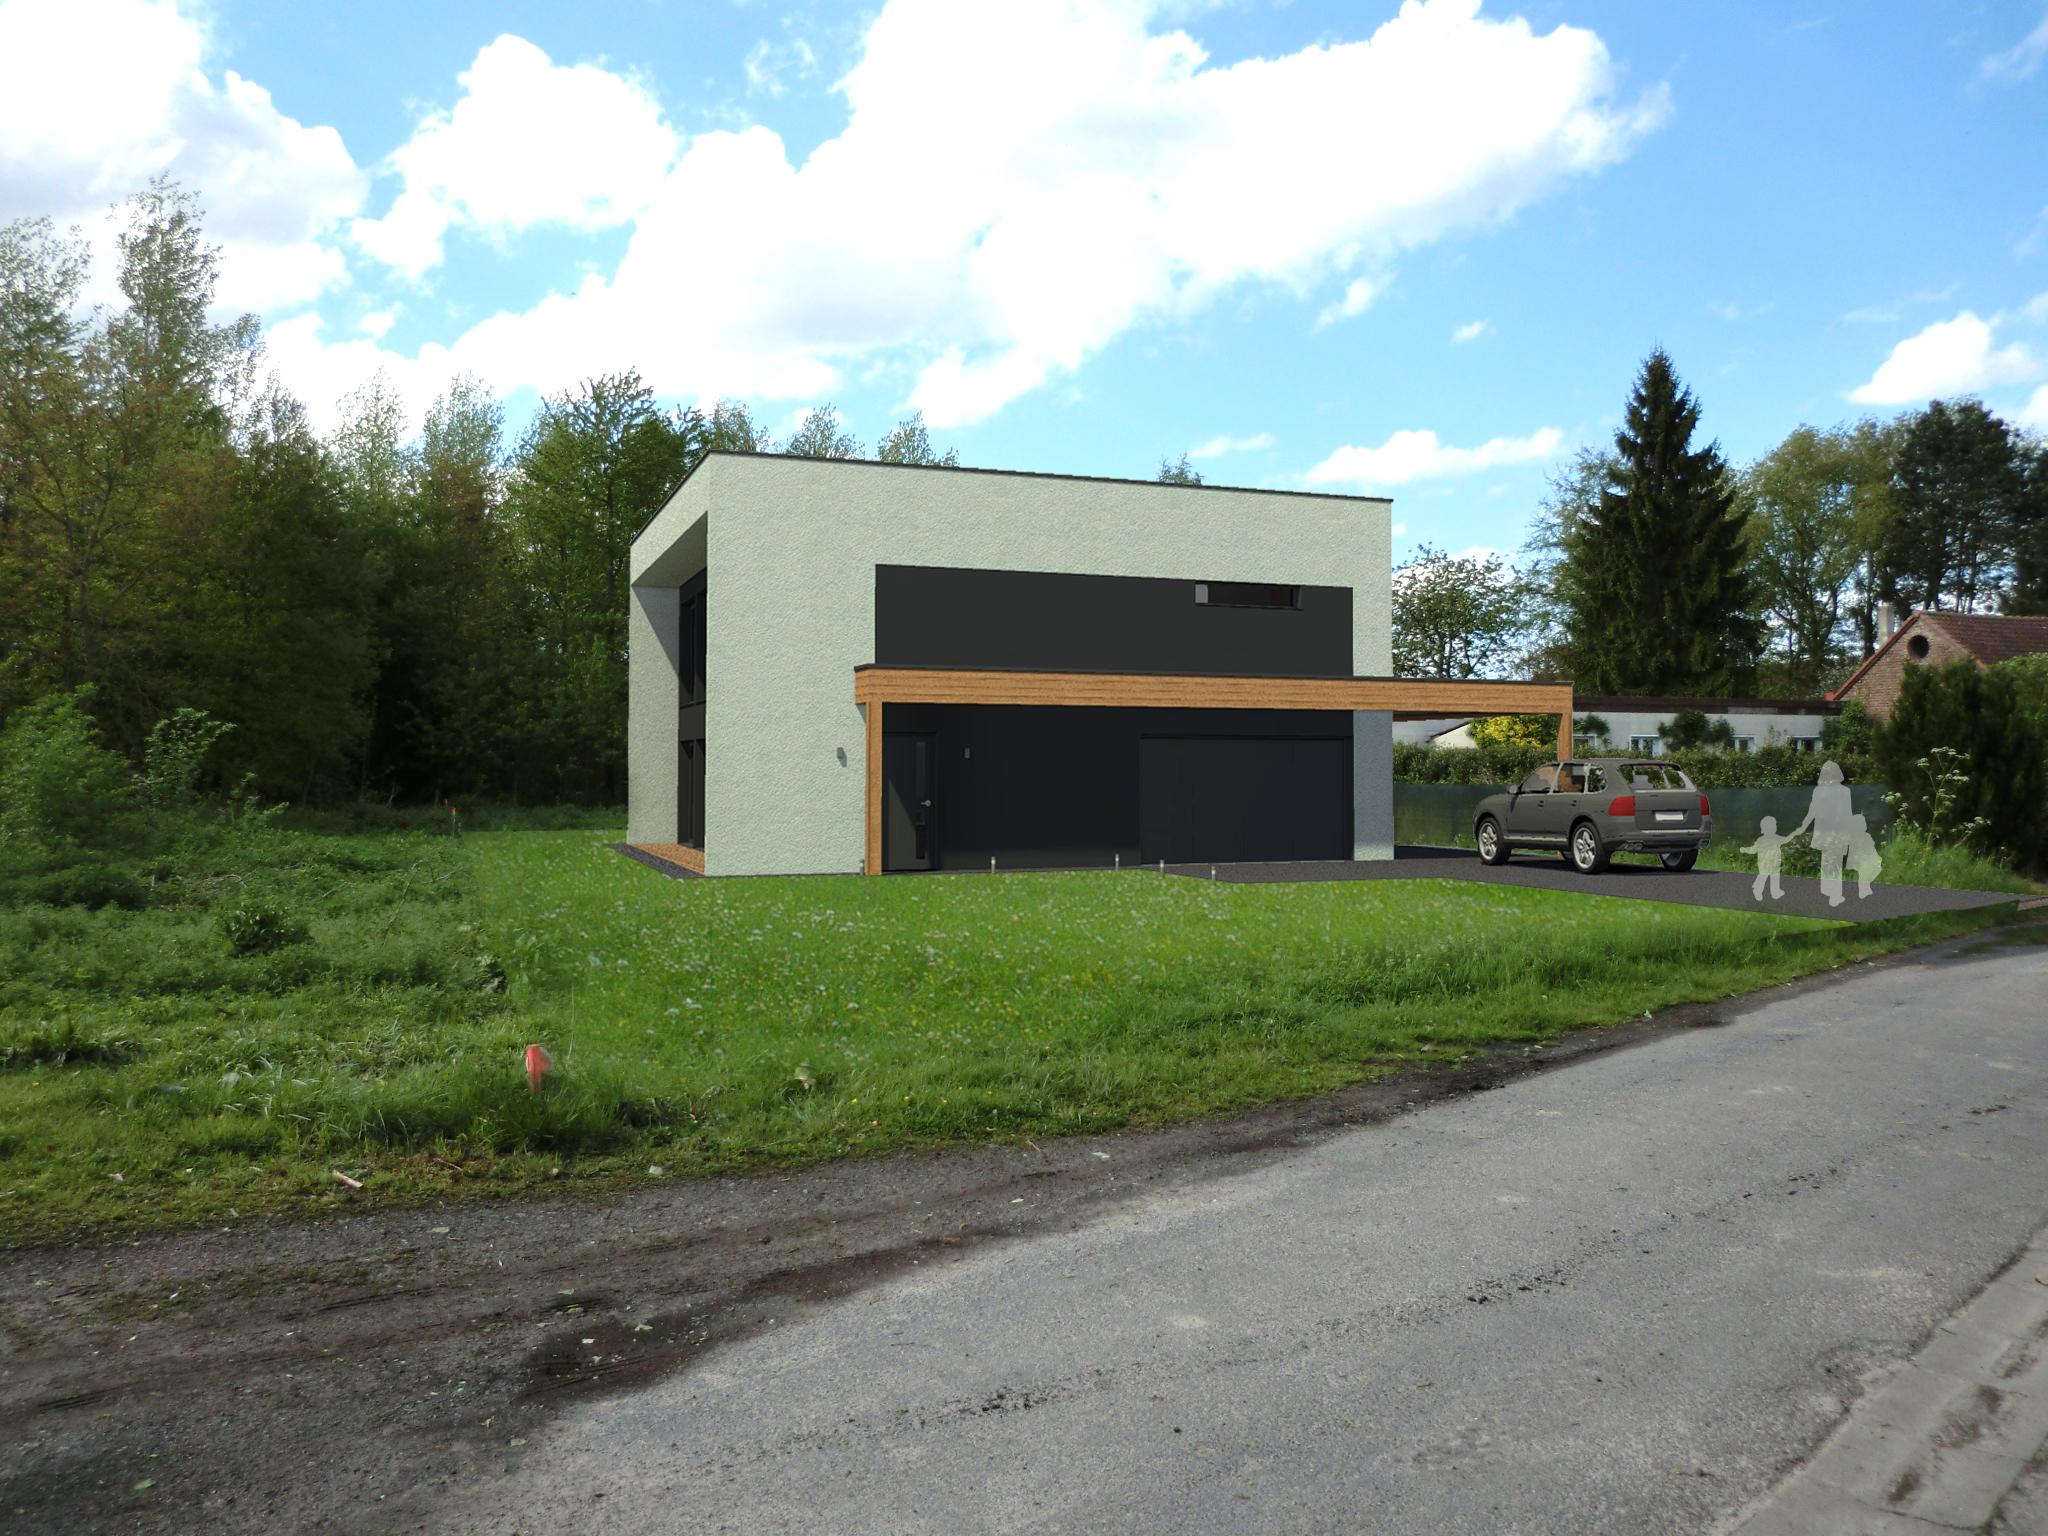 15.17 Permis de construire maison nord Thun Saint Amand13